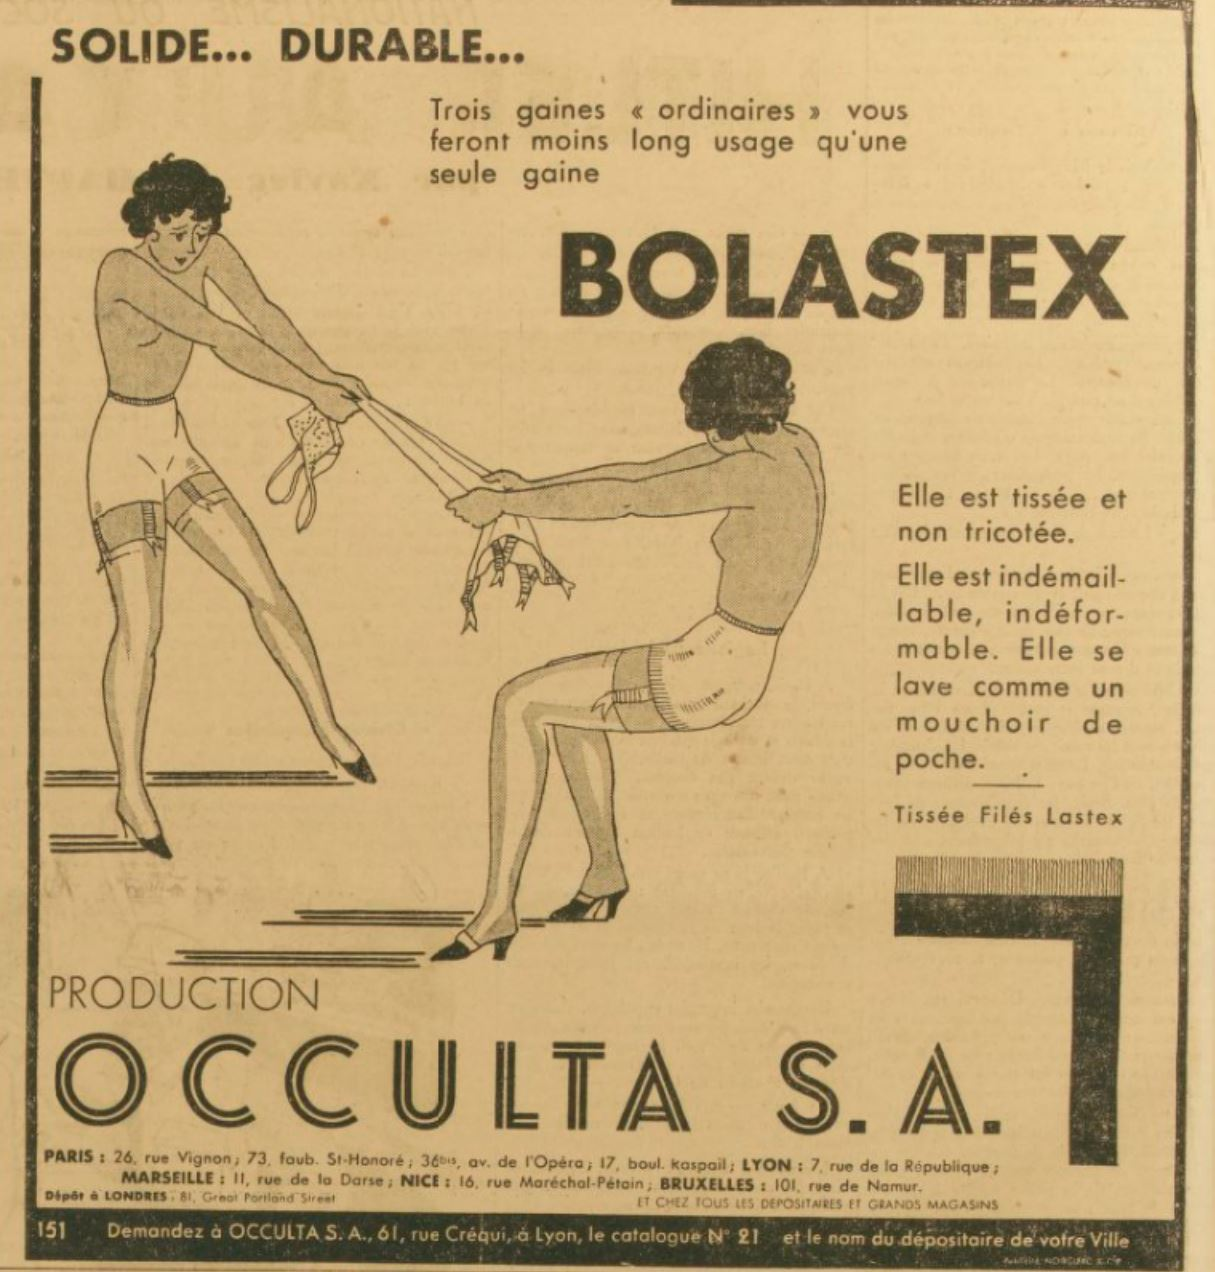 Occulta 1934 Bolastex Gringoire 26 octobre